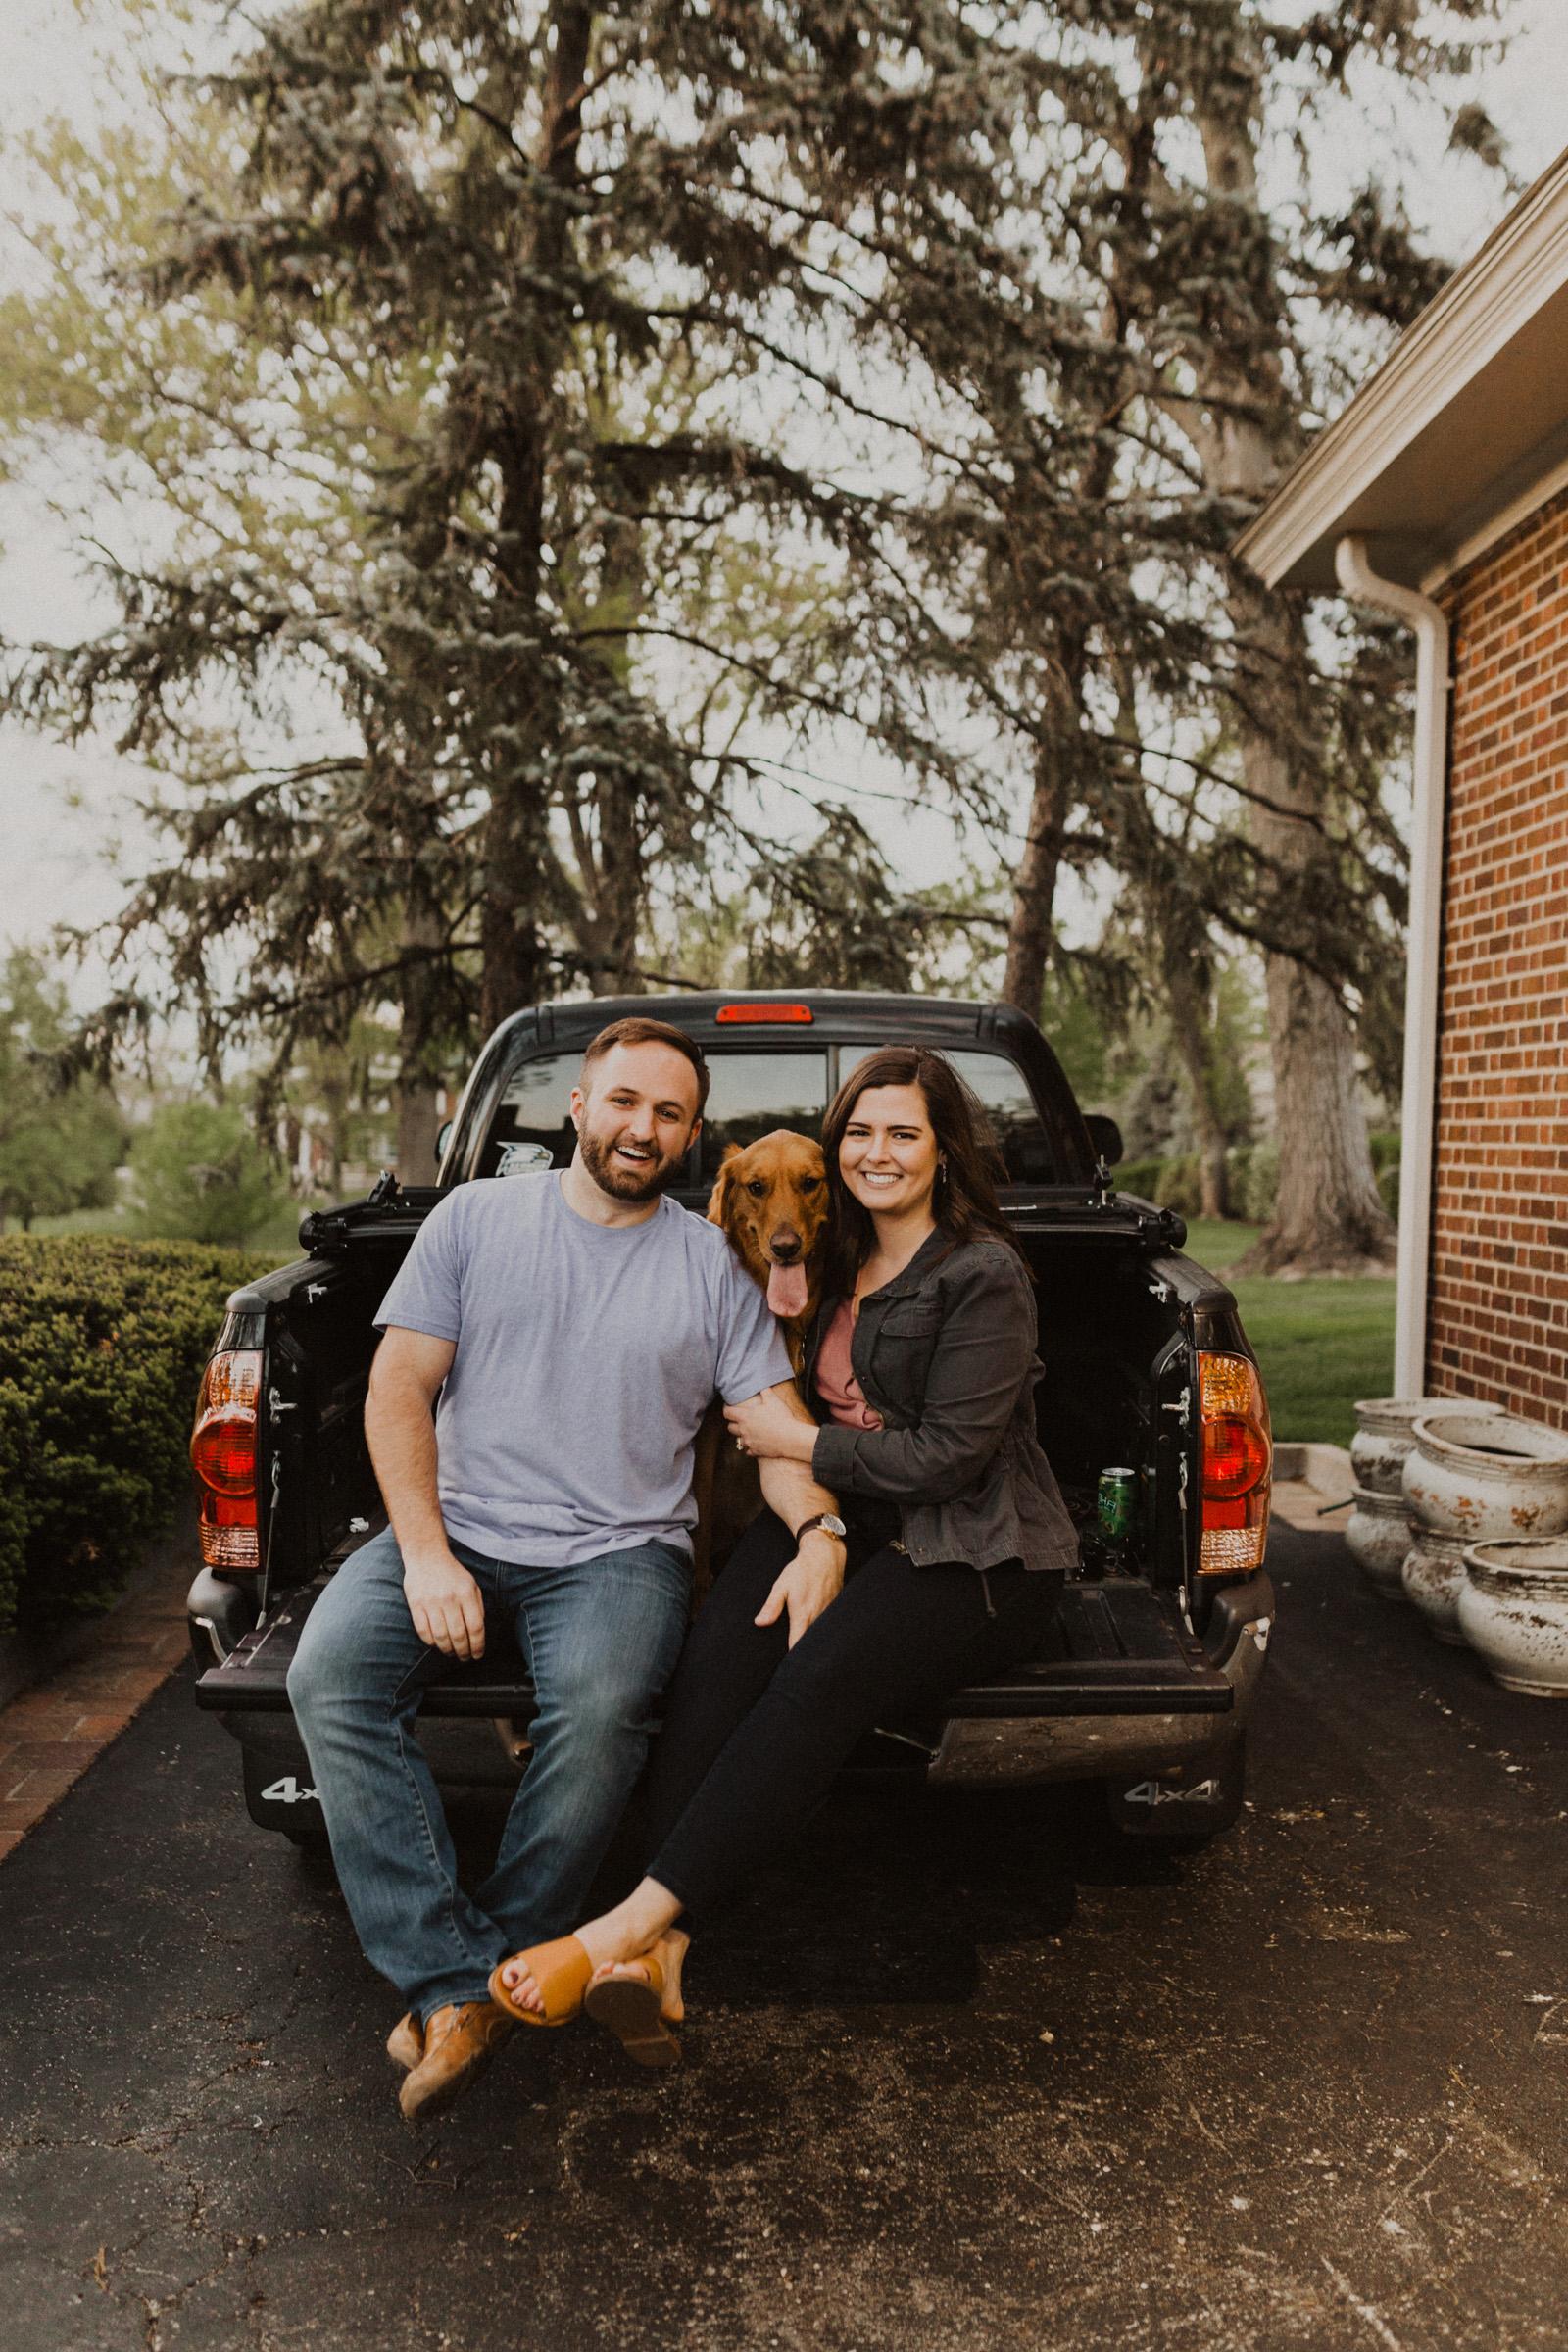 alyssa barletter photography brookside waldo in home yard session in spring with golden retriever dog-24.jpg